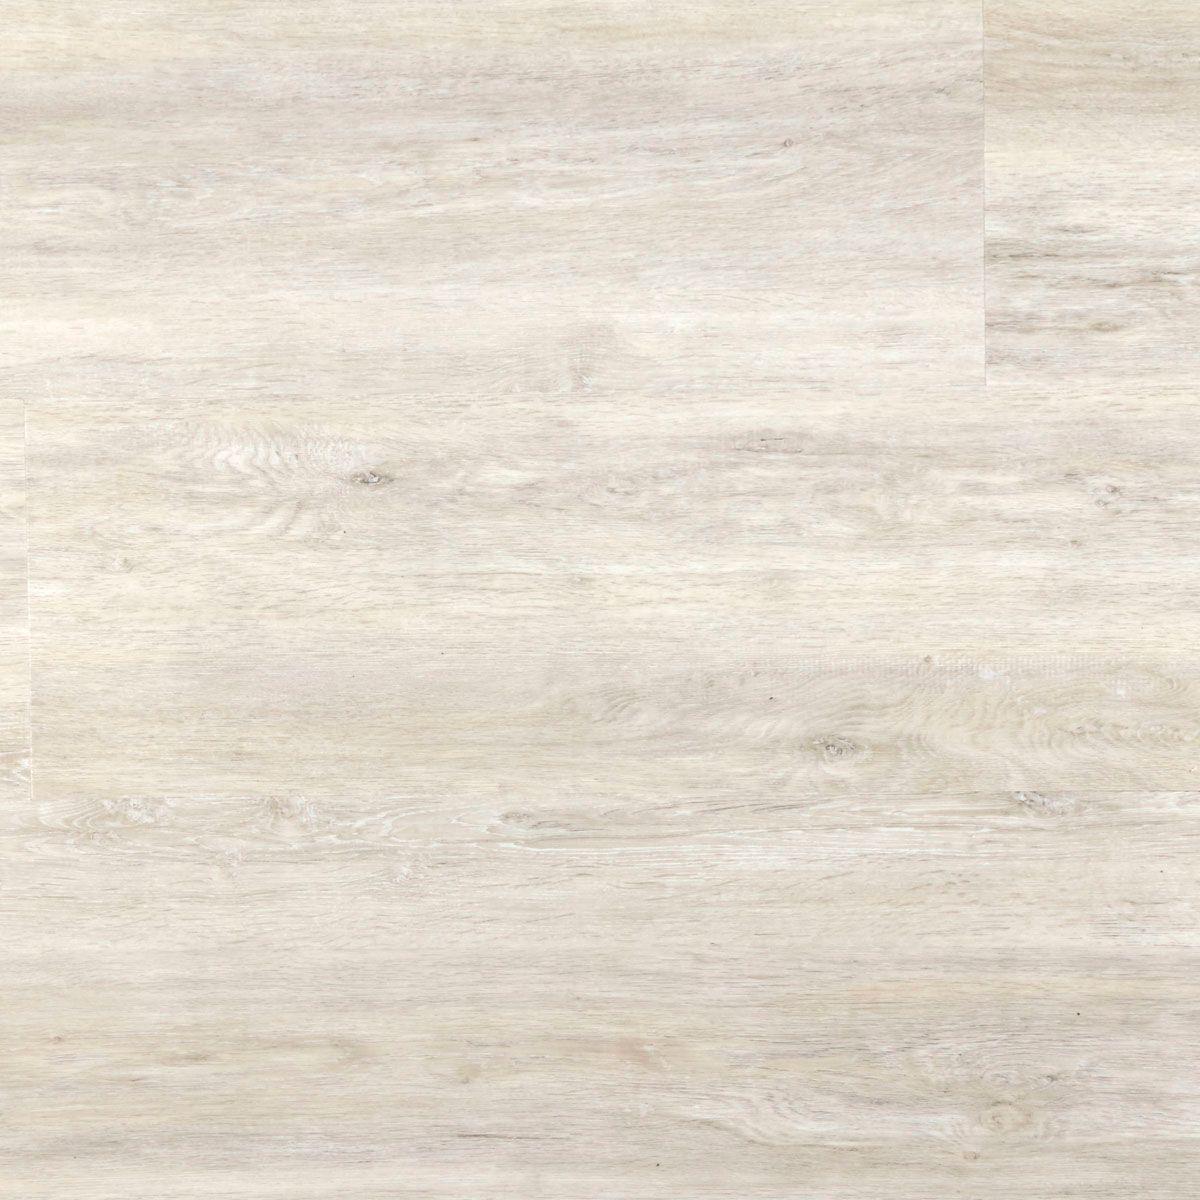 Lame clipsable chêne beige clair 5mm Morino